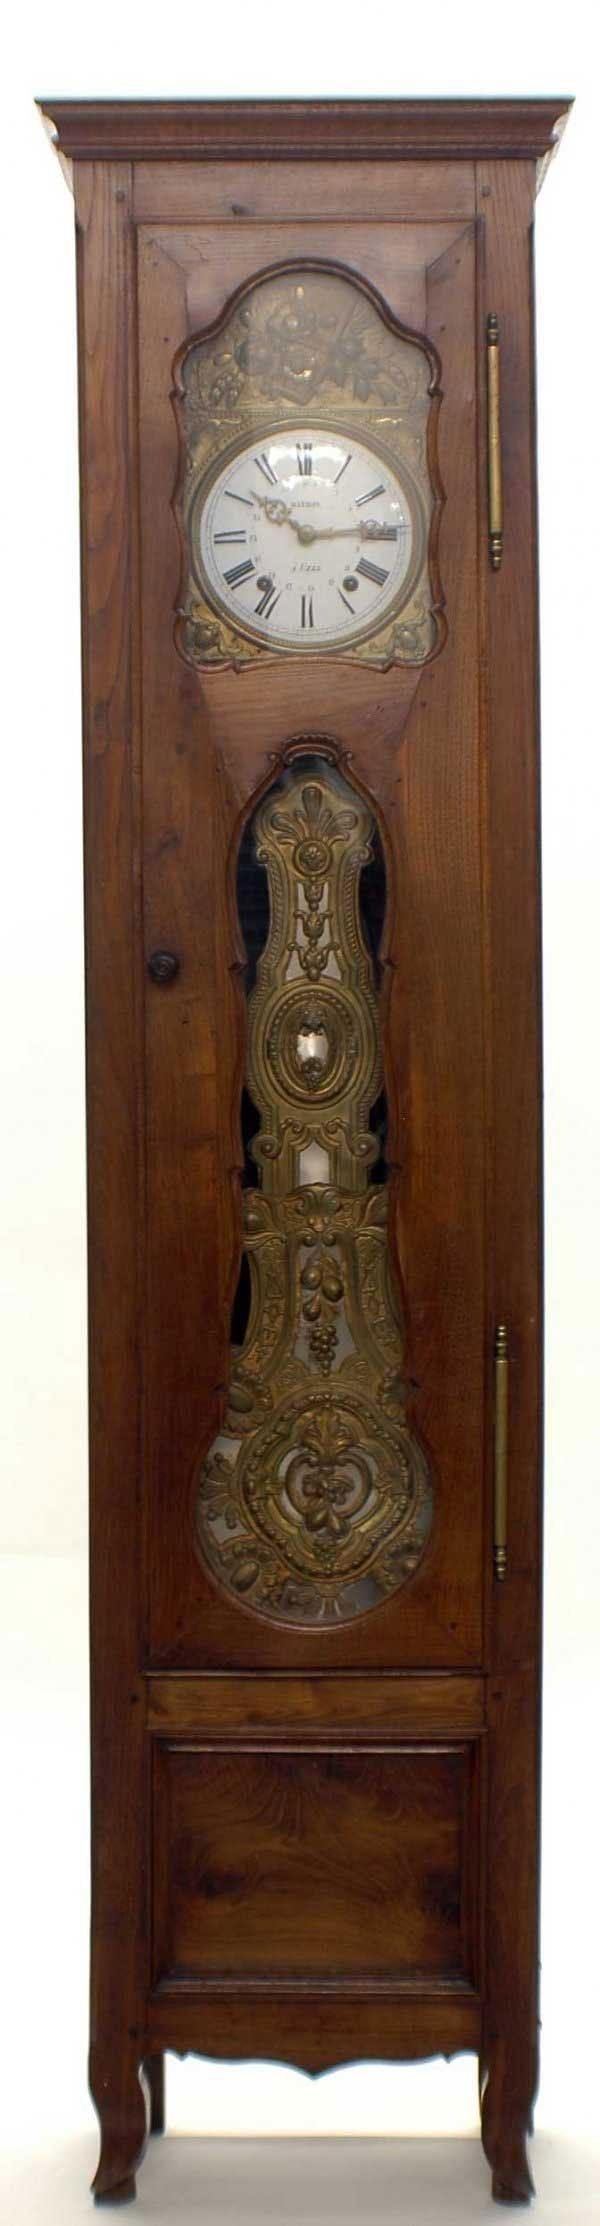 1021: LOUIS XV PROVINCIAL WALNUT TALL CASE CLOCK